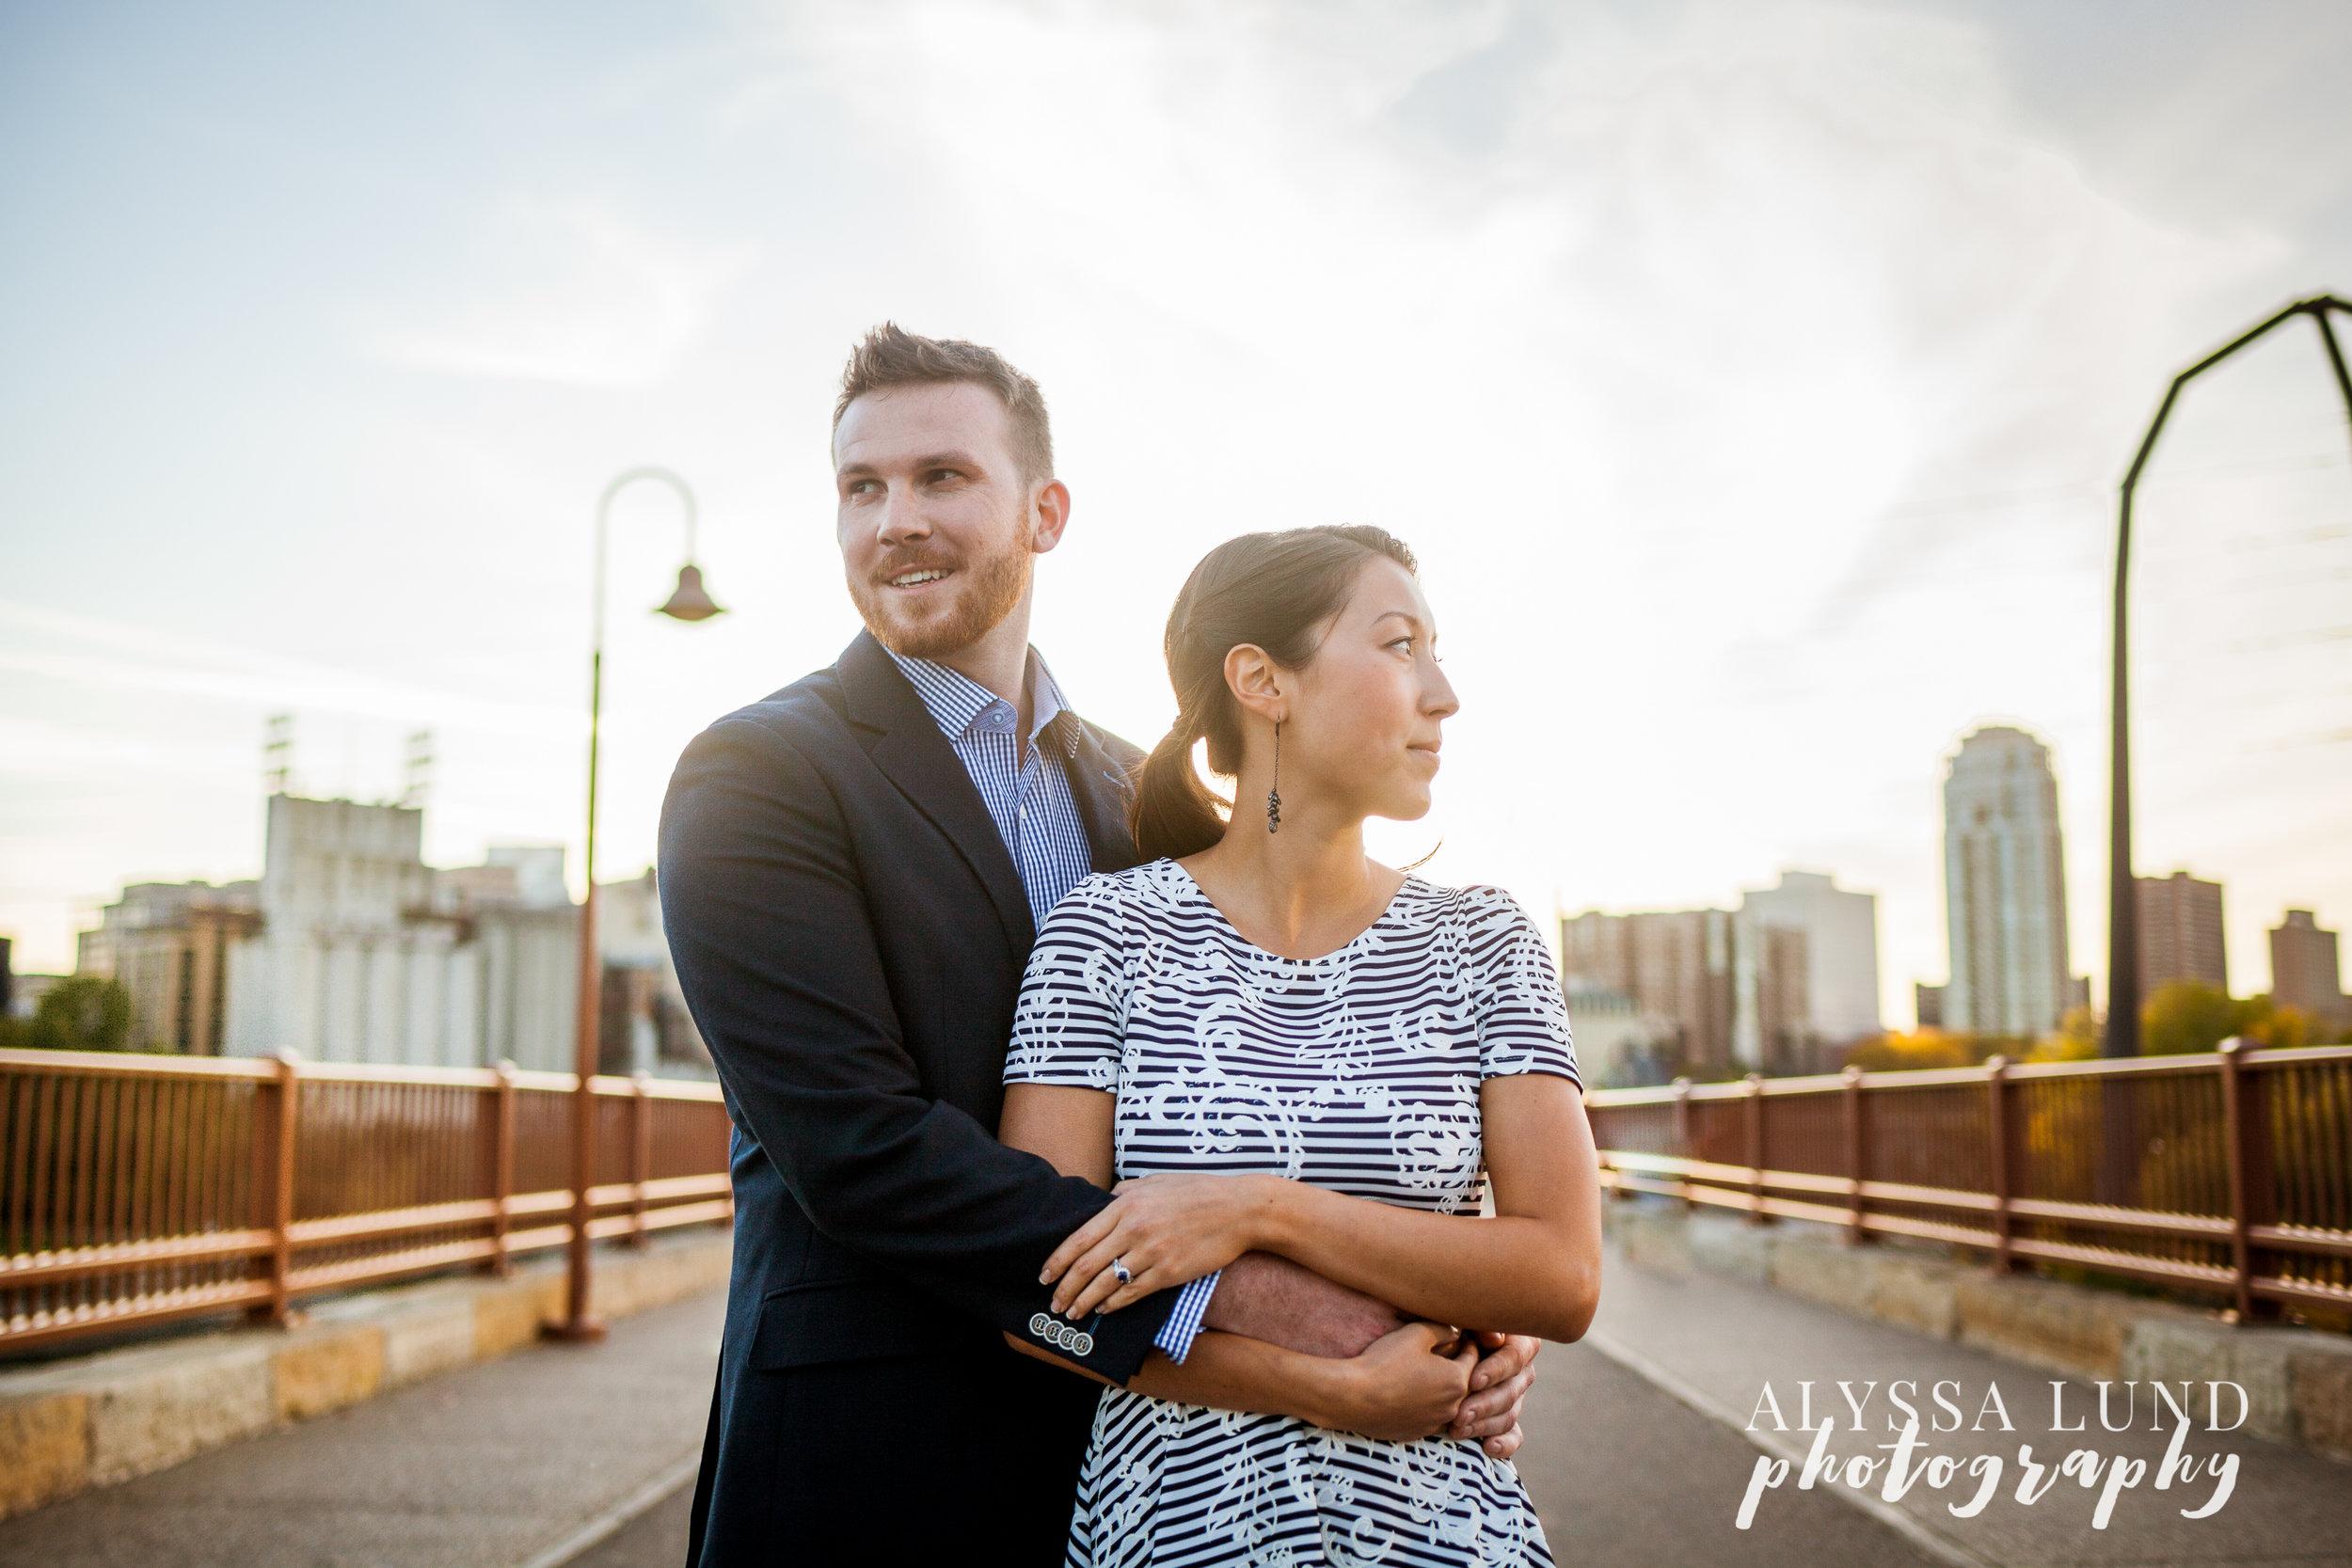 Minneapolis engagement session at the stone arch bridge